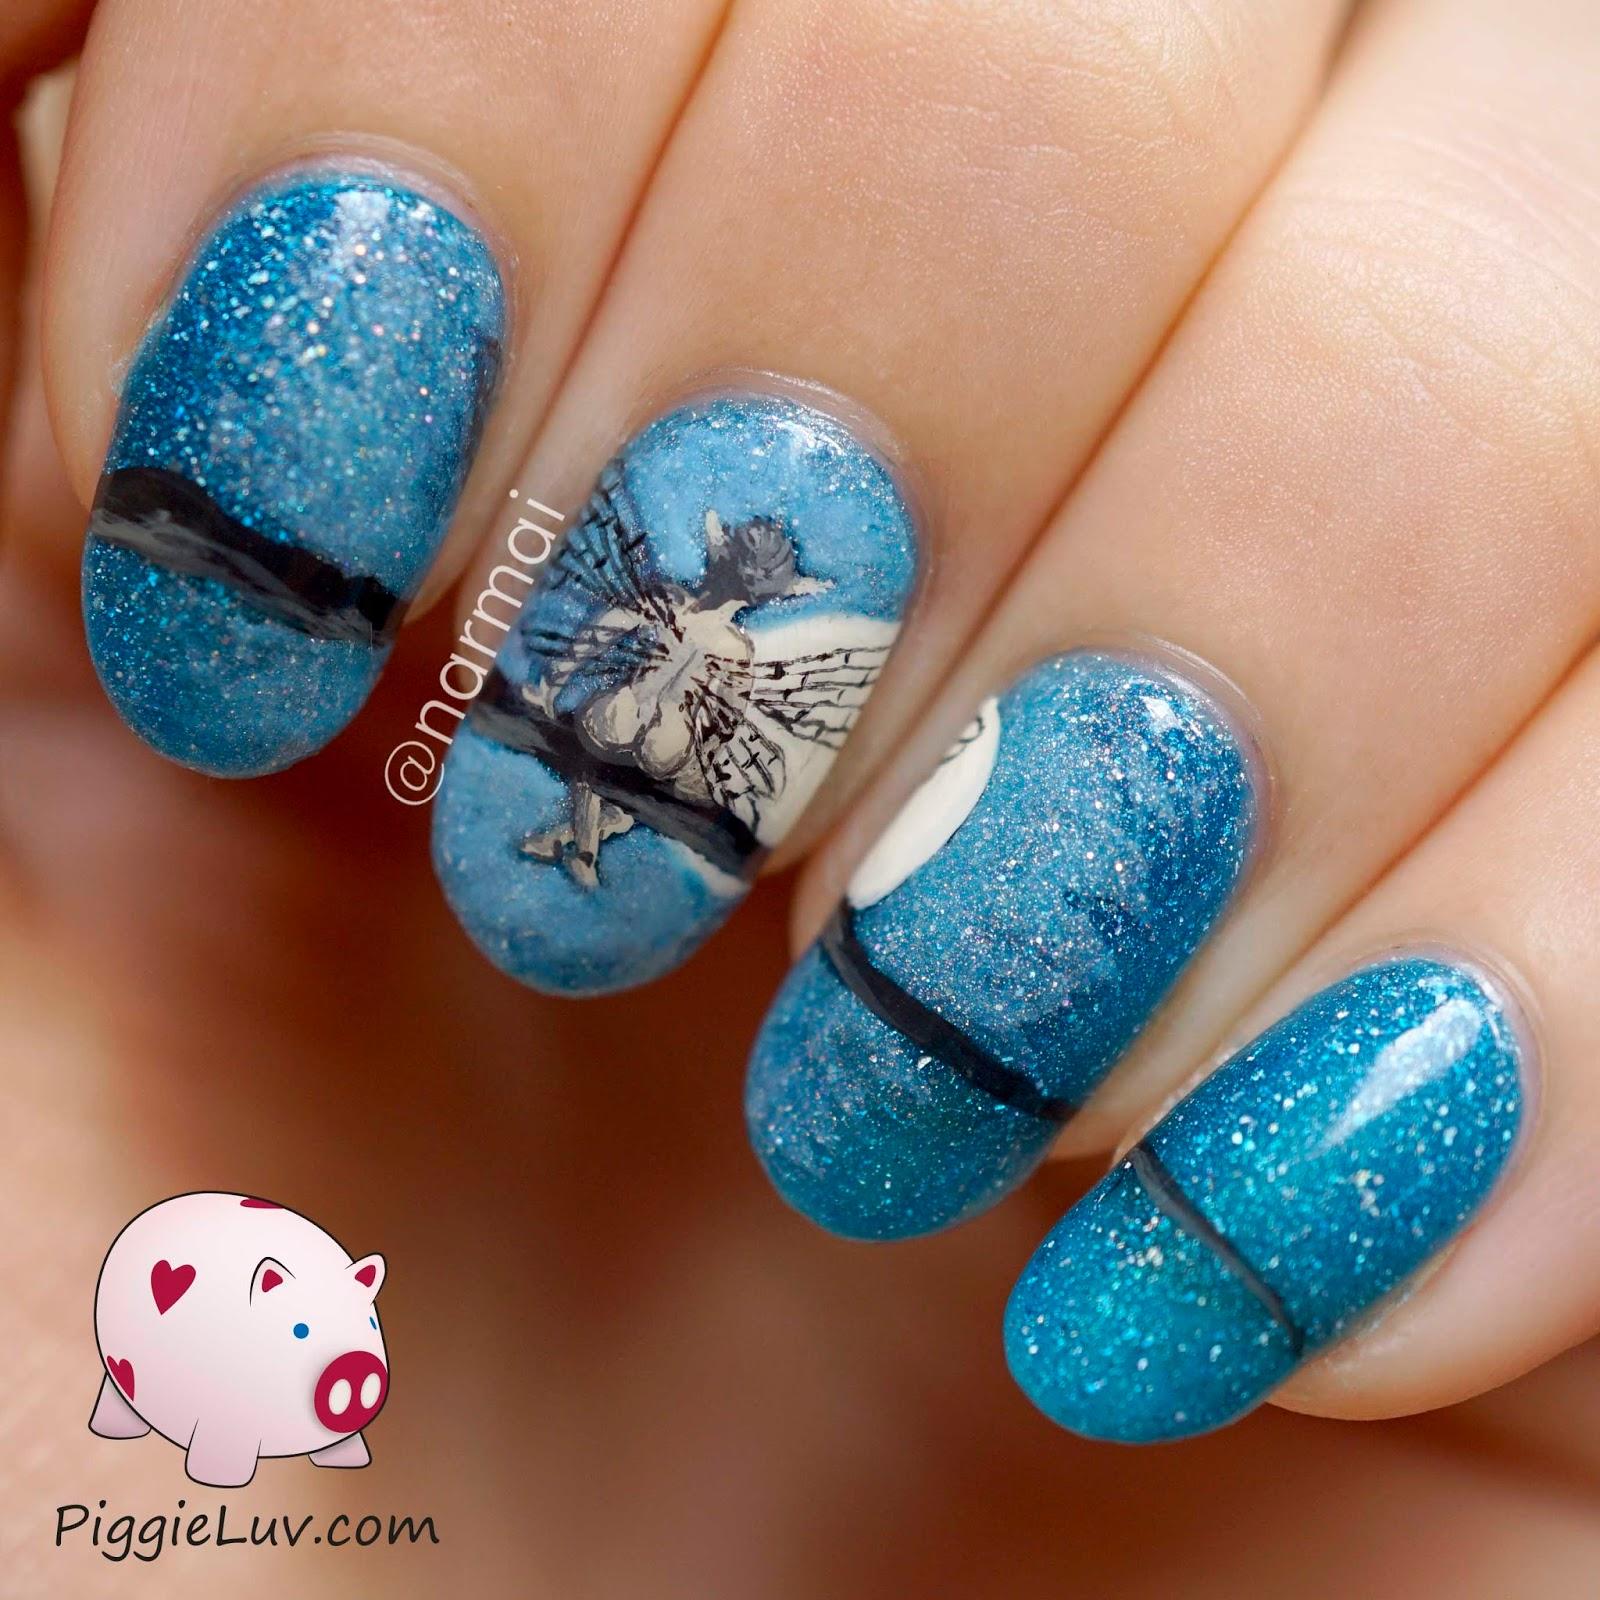 PiggieLuv: 'Cheeky' midnight fairy nail art